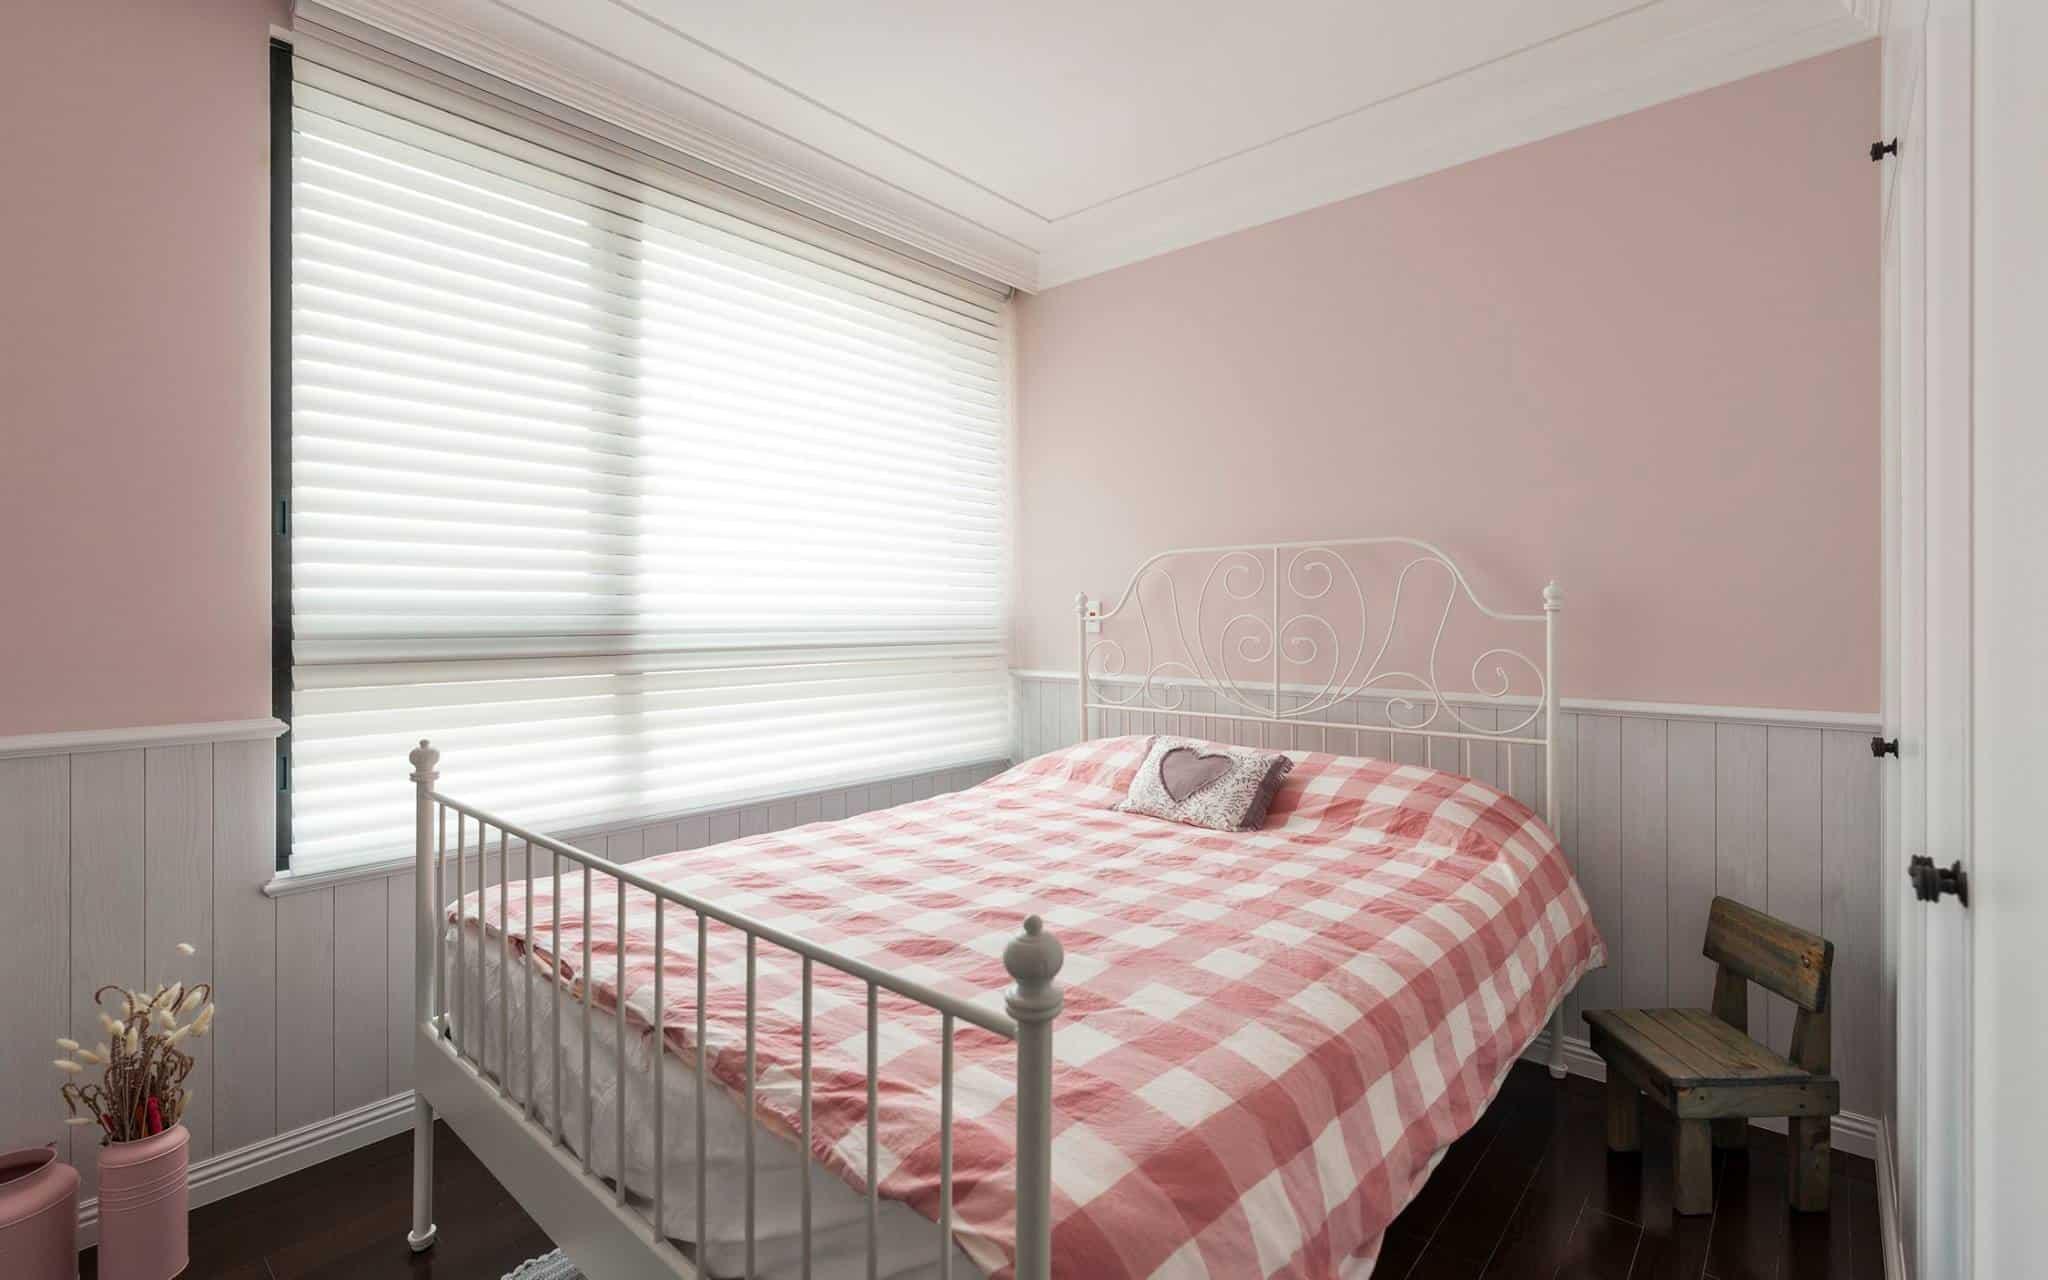 thiet-ke-noi-that-chung-cu-cau-dien-11 Thiết kế nội thất chung cư Cầu Diễn - A. Khoa